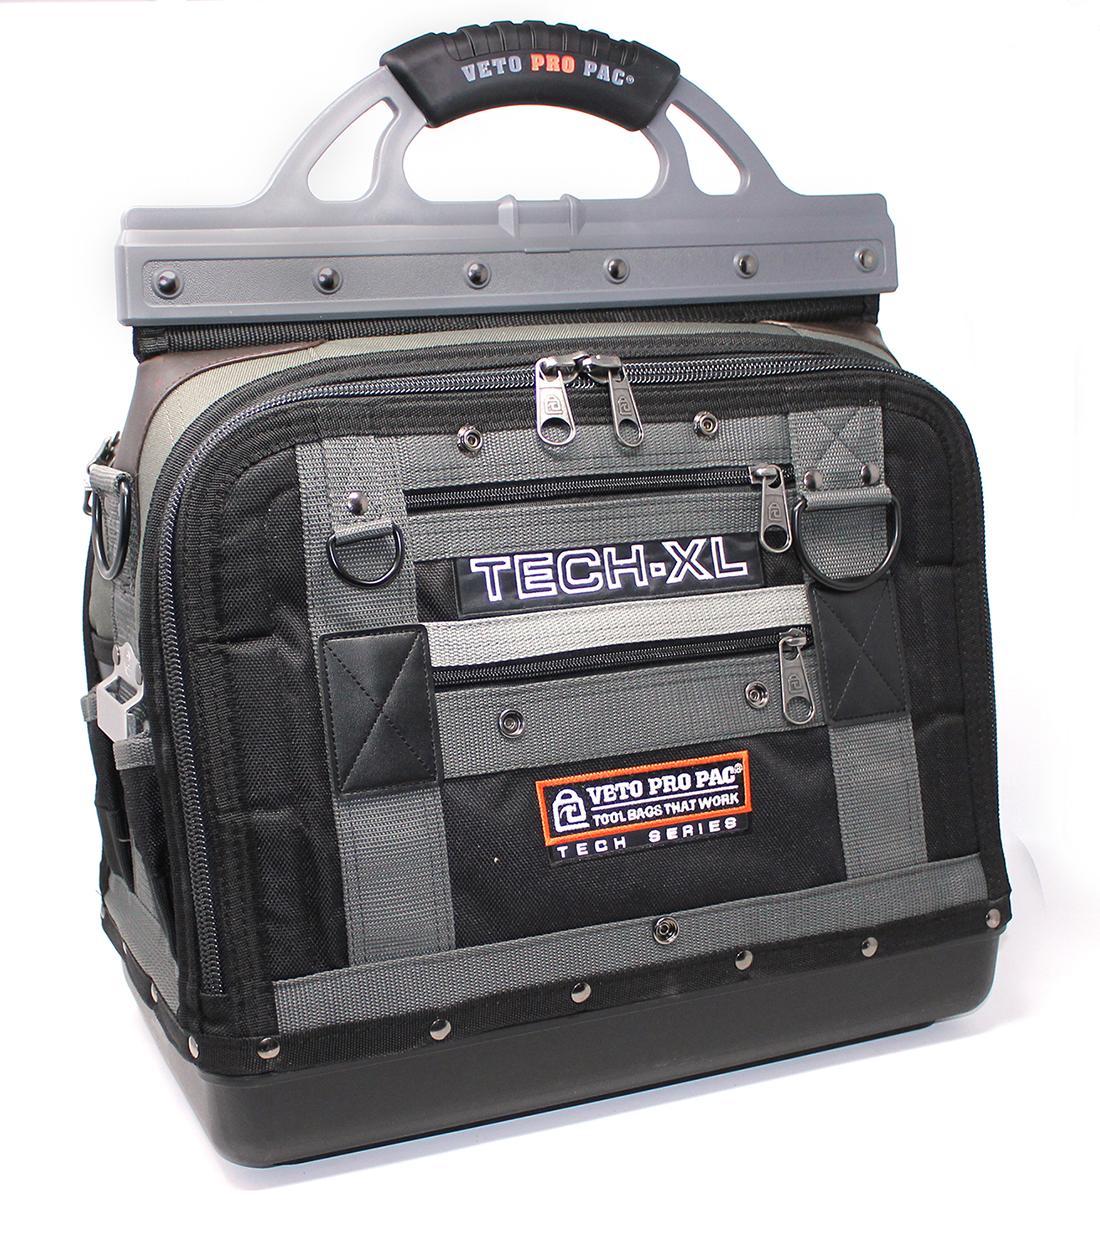 38ae13640b4 Tech XL Tool Bag - VetoProPac